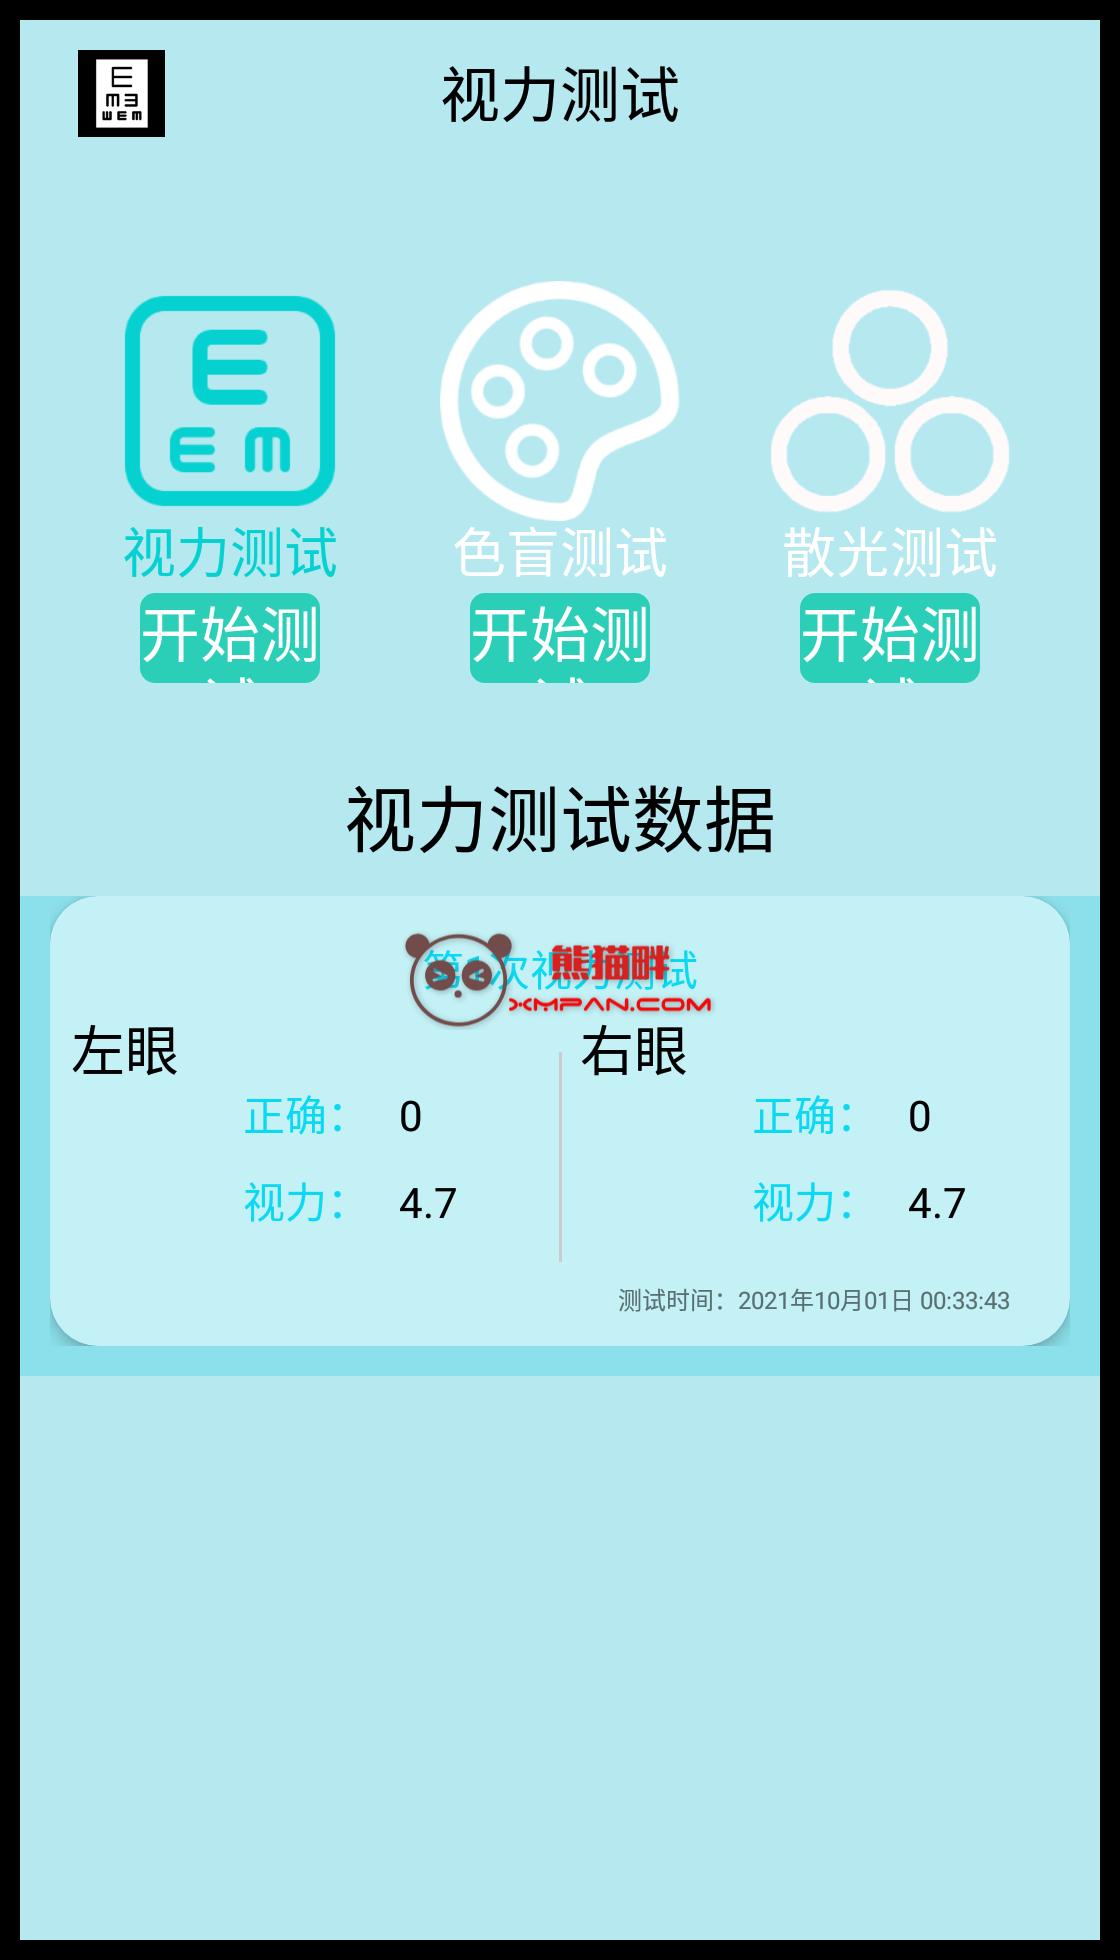 Screenshot_20211001-003356.png